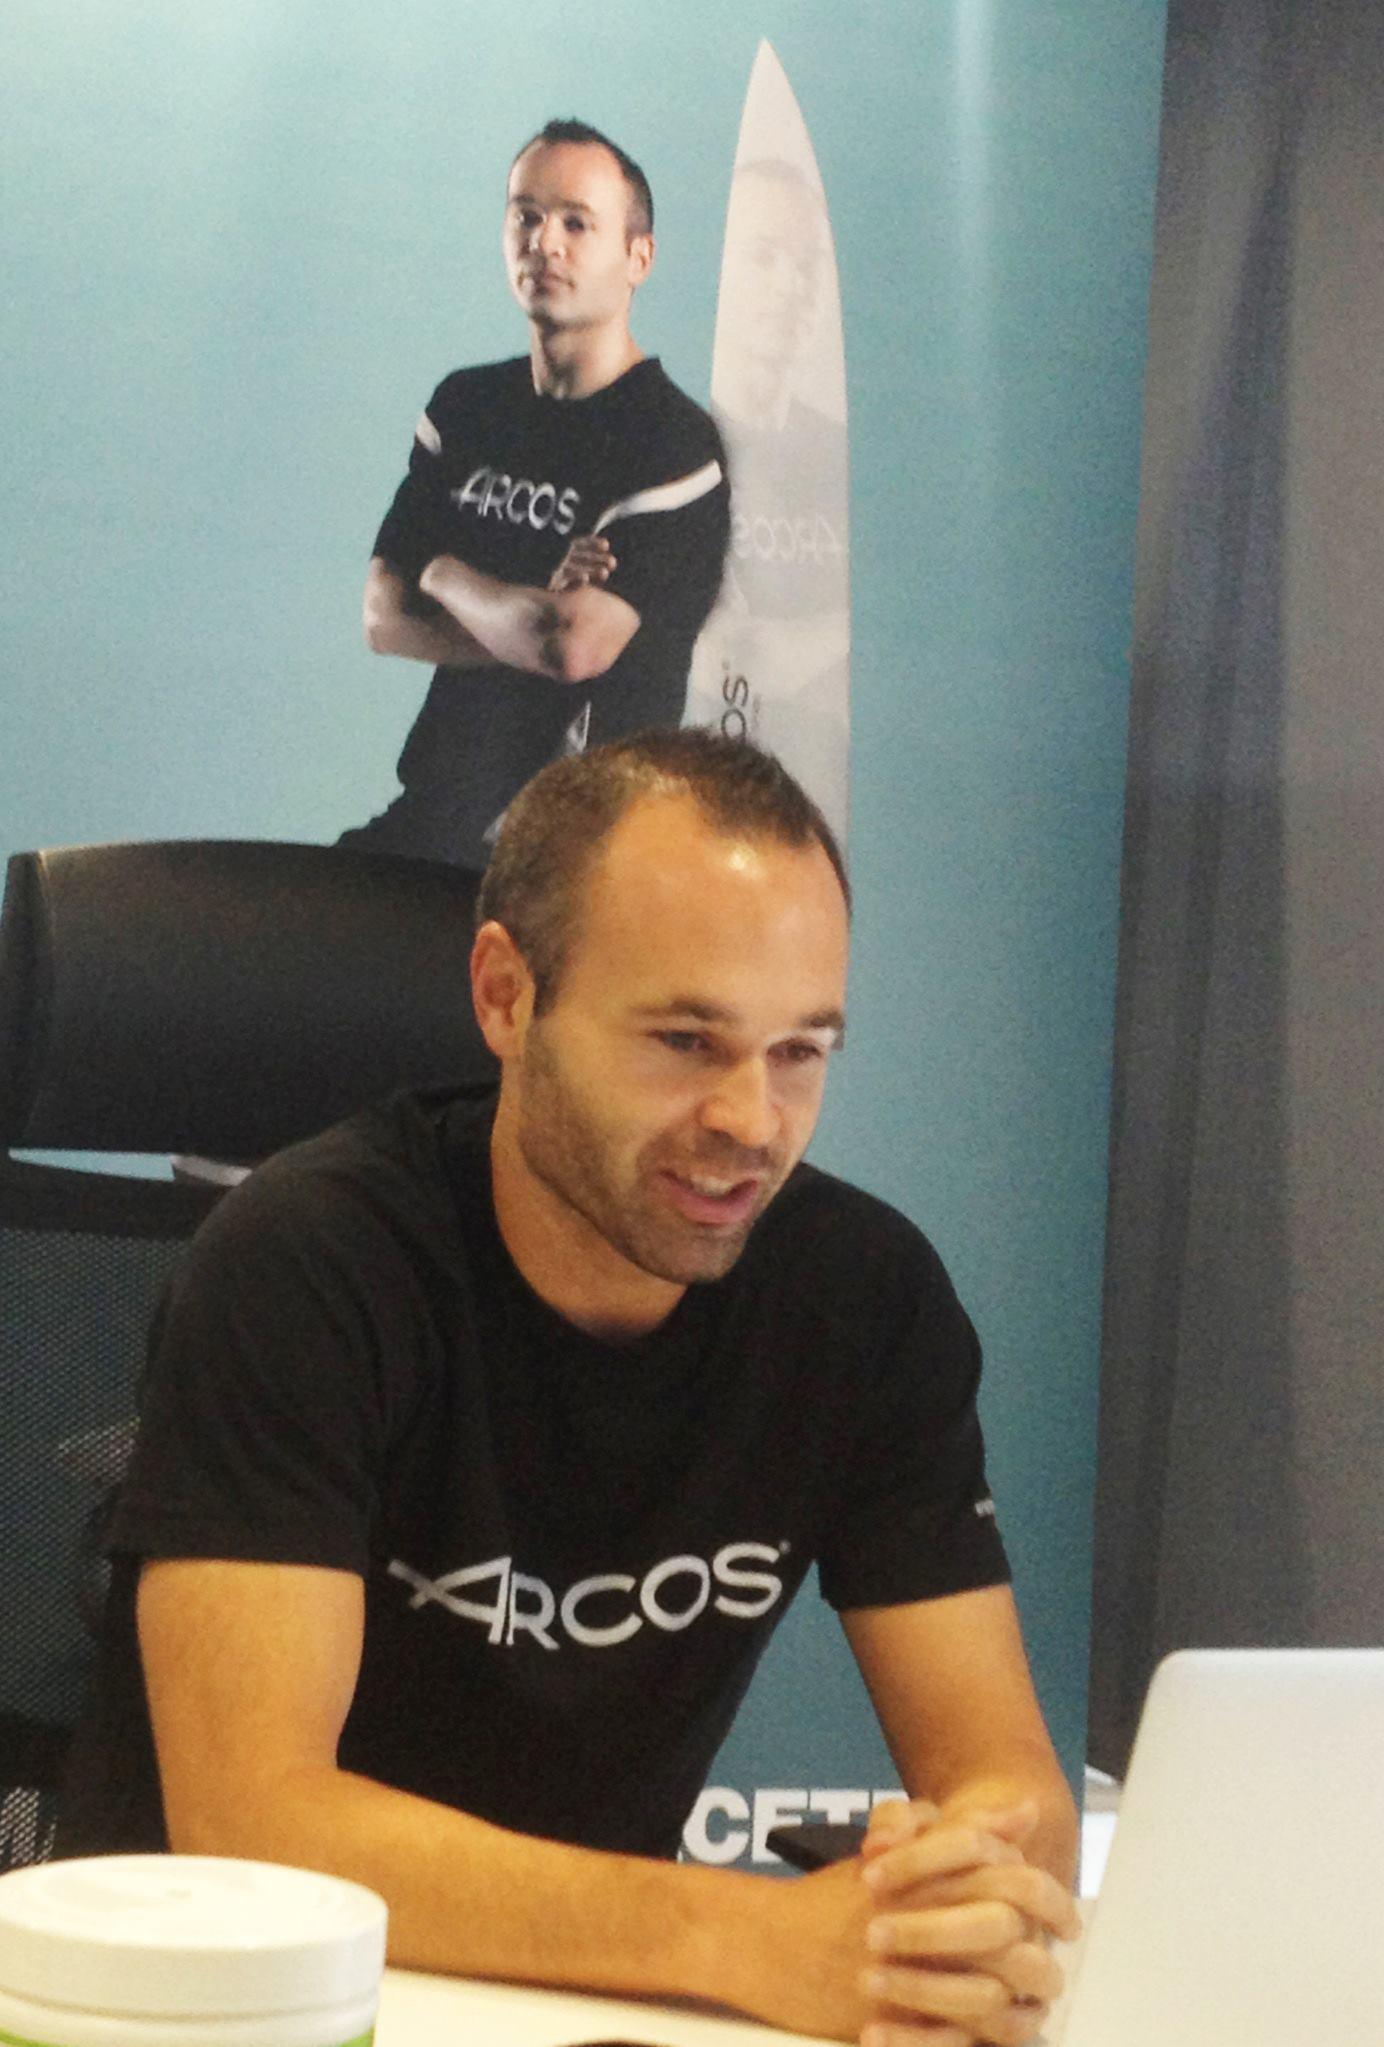 Andres Iniesta Brand Endorsements Brand Ambassador Sponsorship Partners Advertising TVC Spain Barcelona Arcos